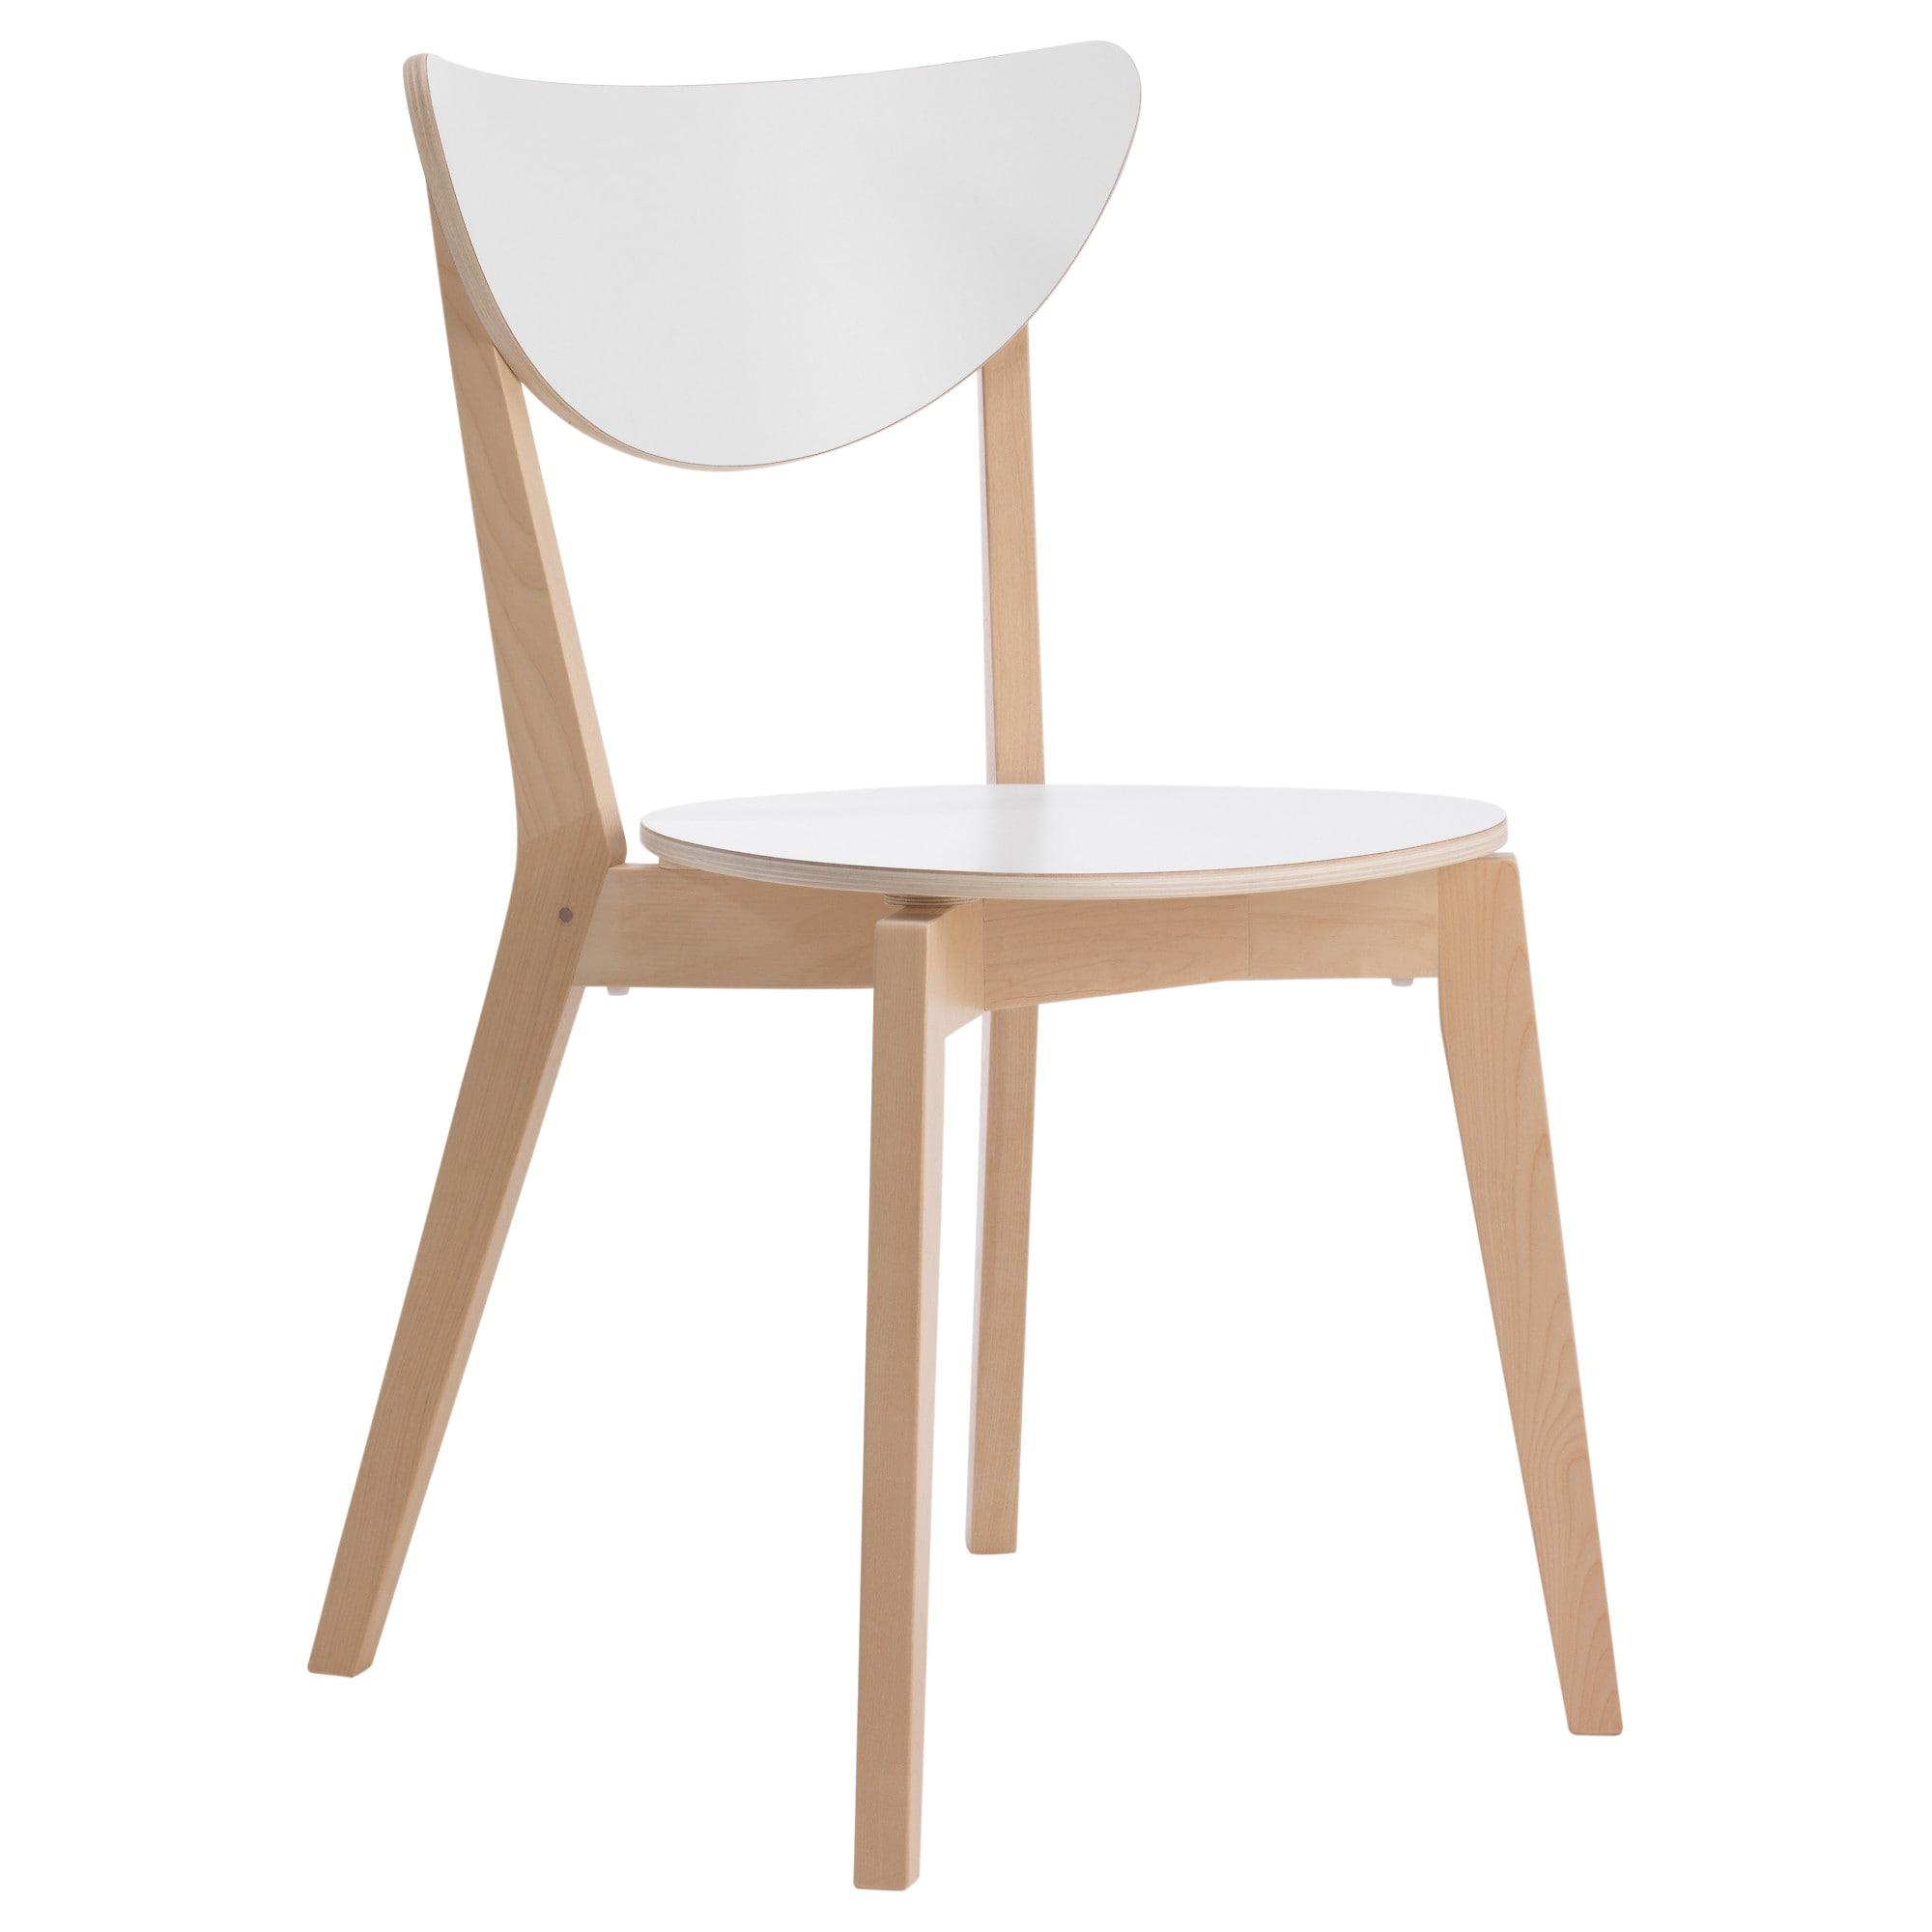 Silla Cocina Ikea 9ddf nordmyra Silla Blanco Abedul Ikea